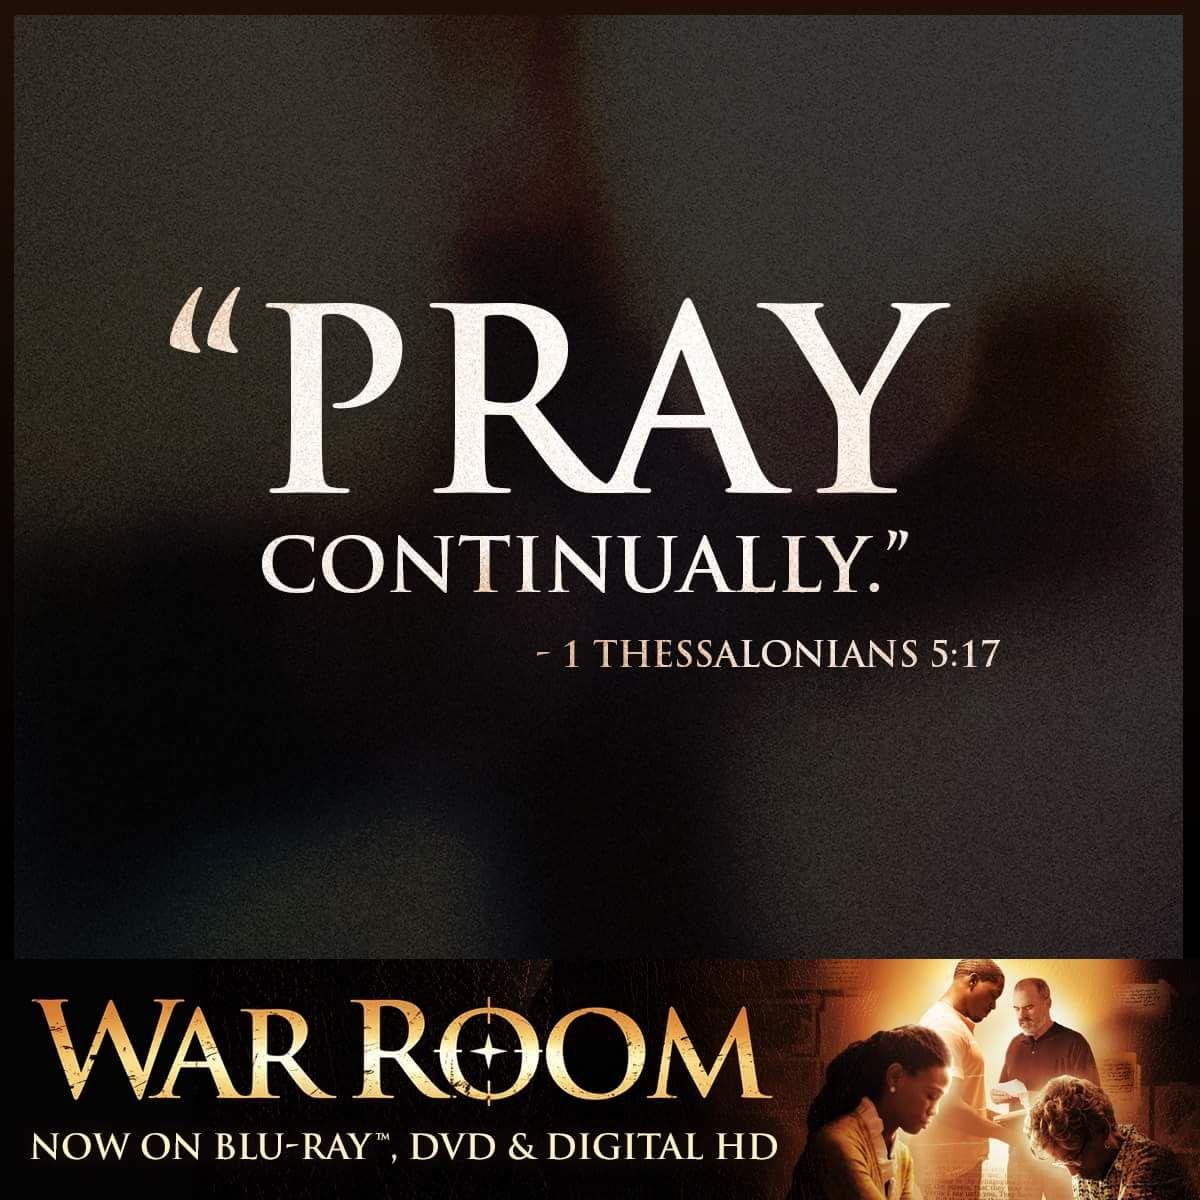 War room | Prayers | Prayer closet, Prayer room, Pray